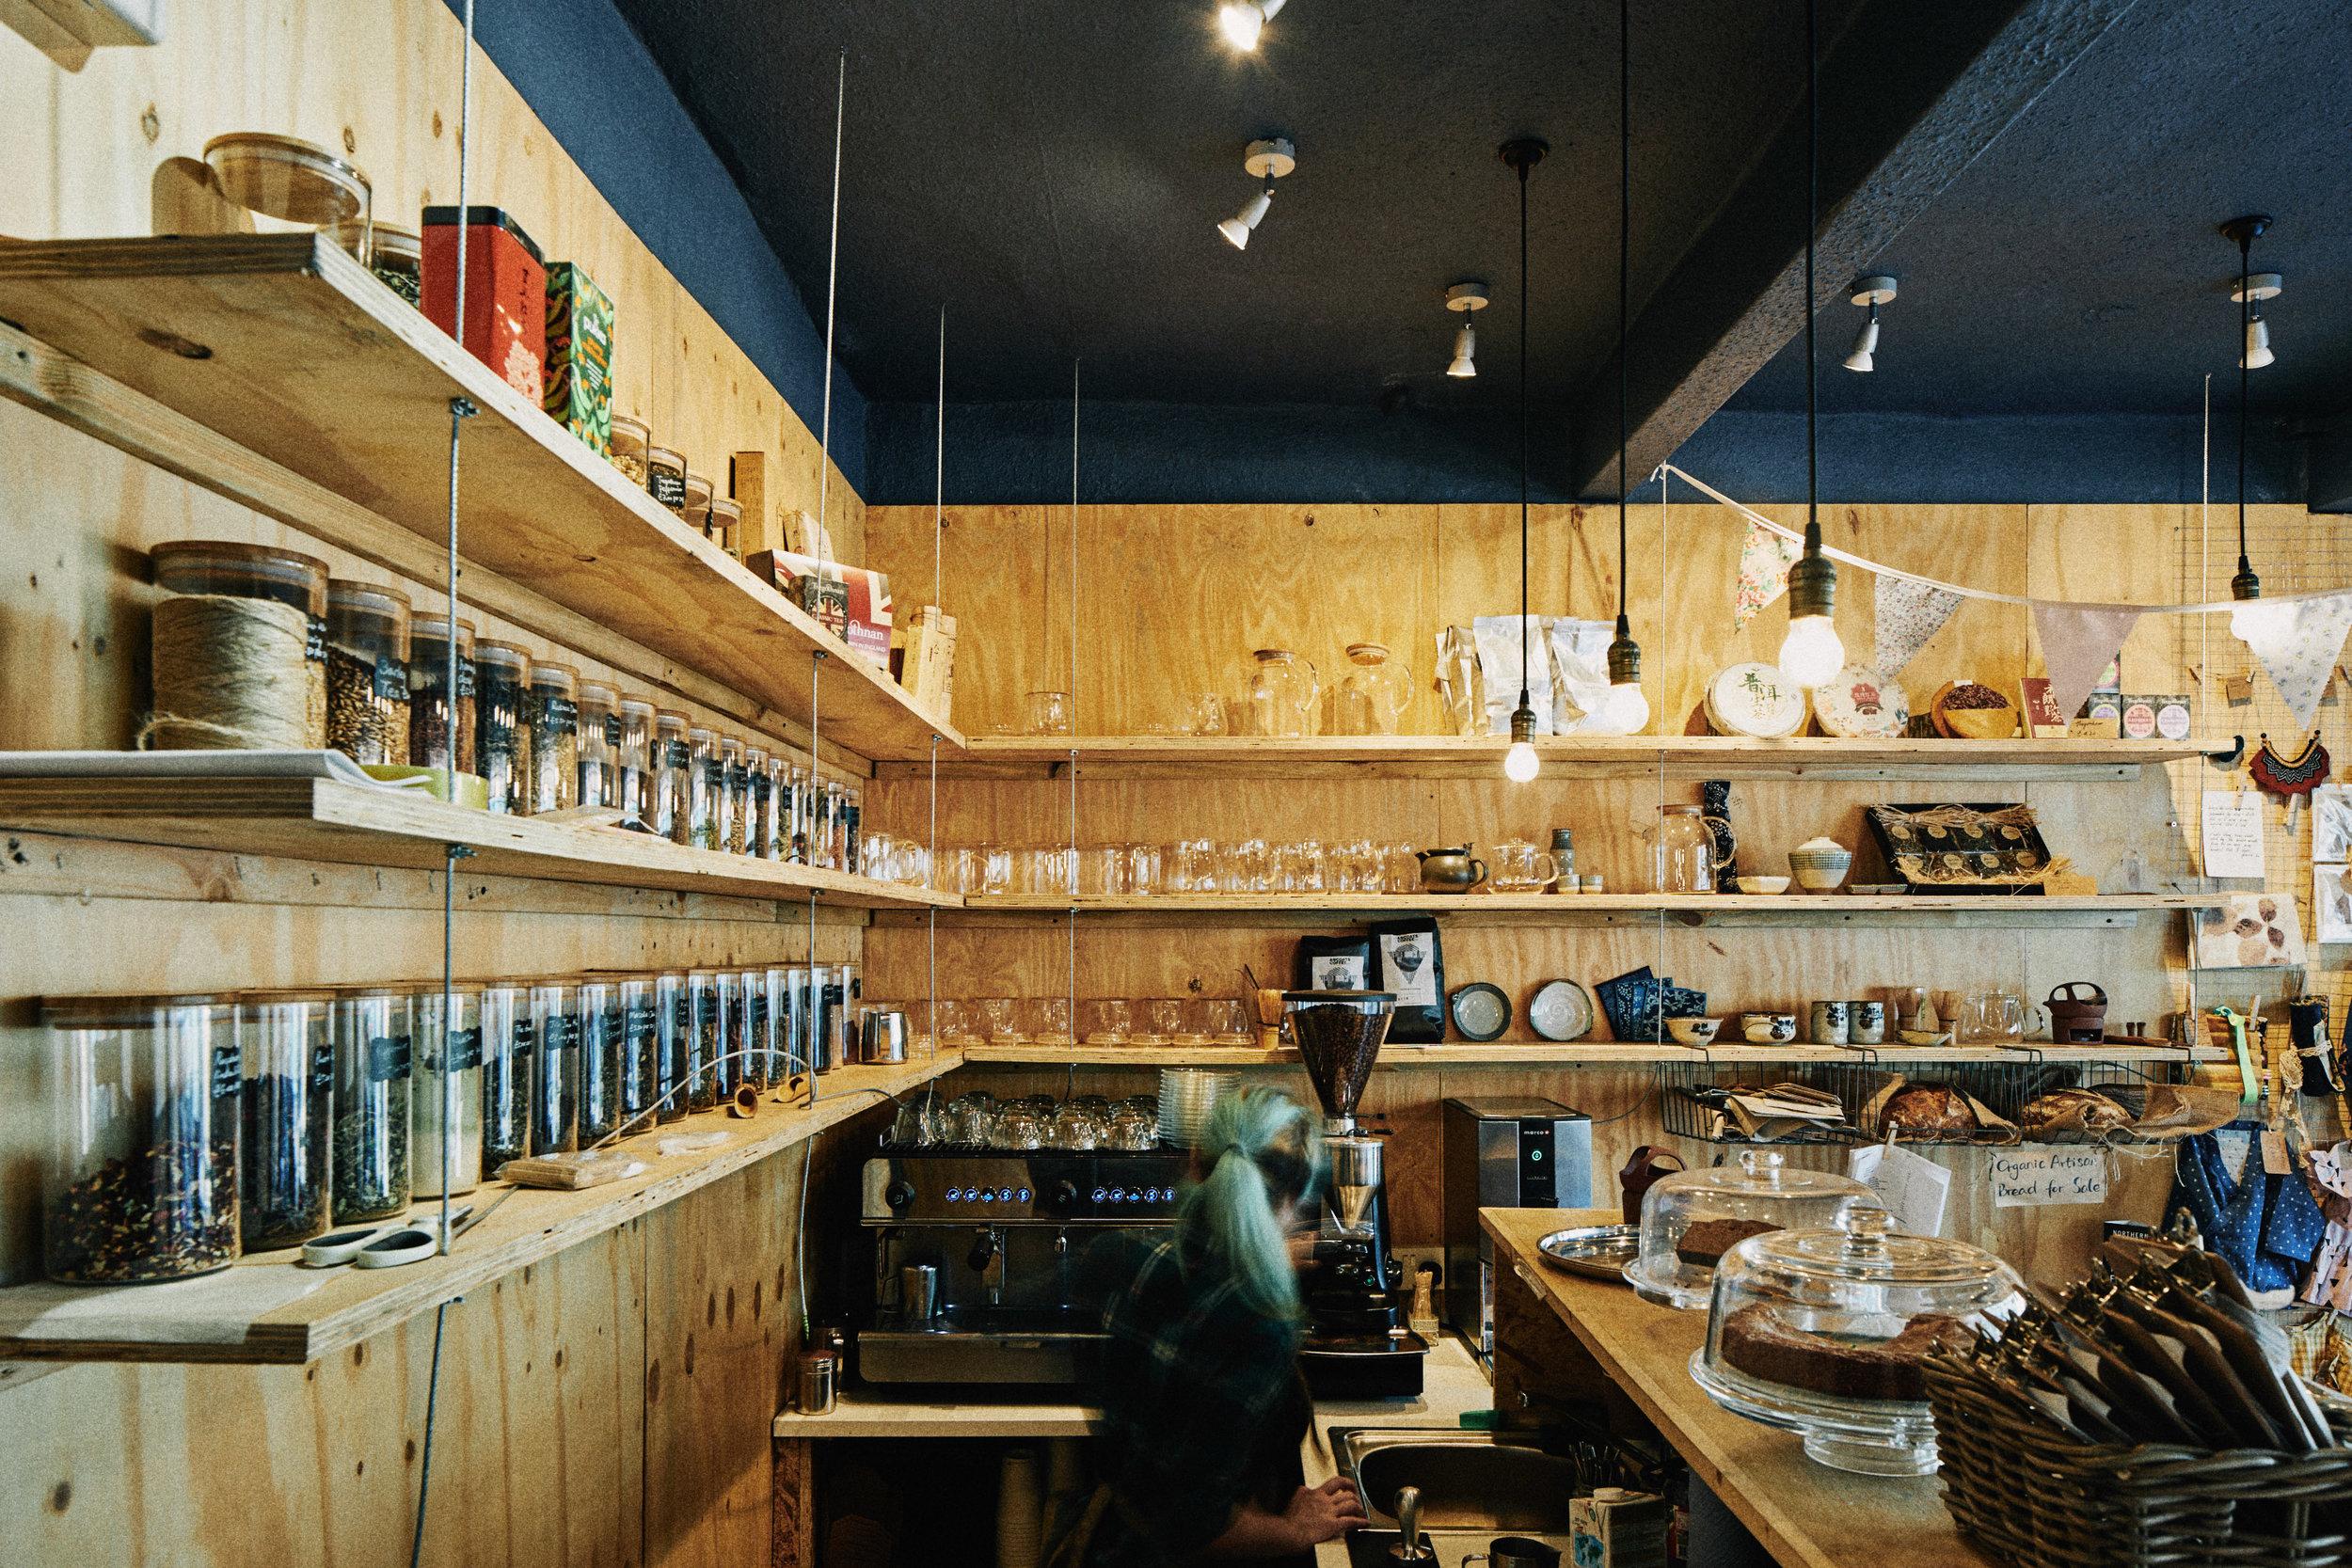 tea_atelier_180925_tea_atelier_interior_0006.jpg